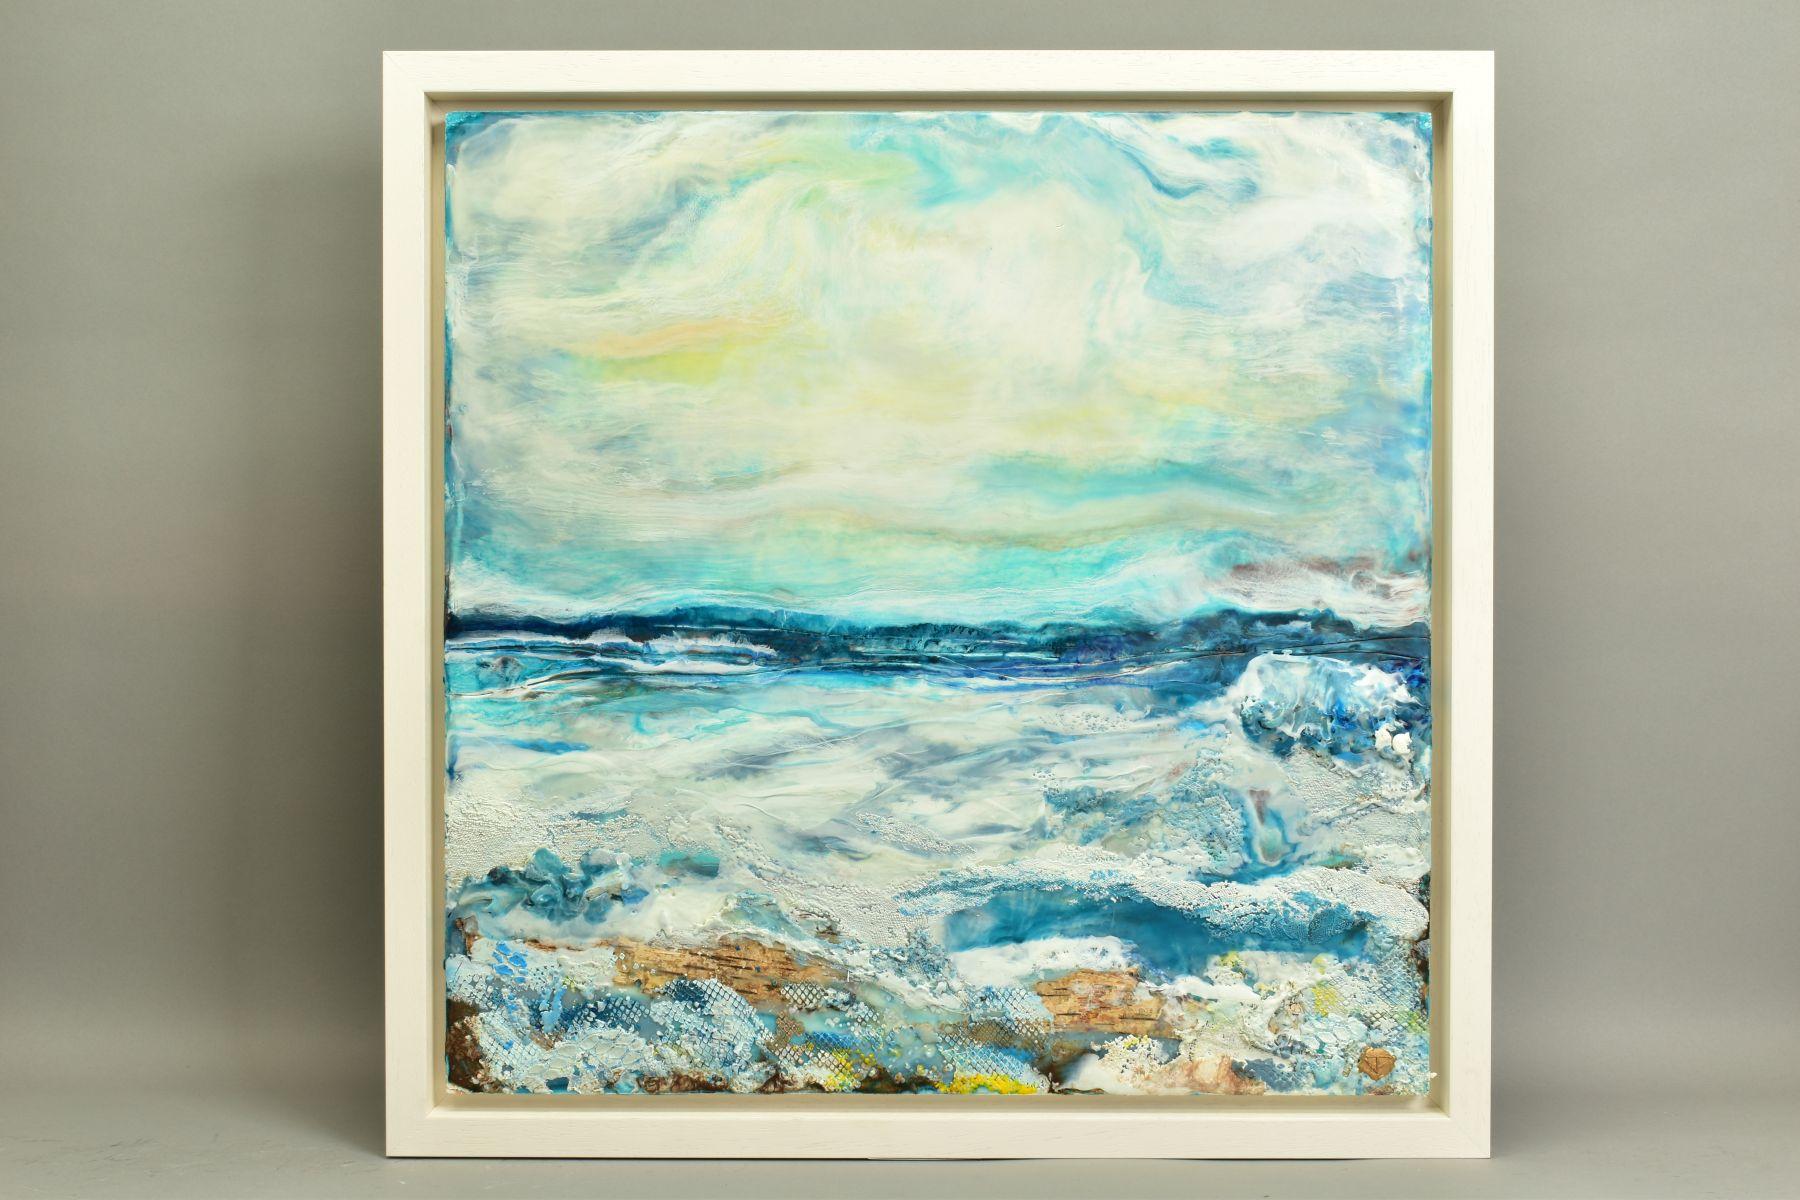 JENNINE PARKER (BRITISH 1971), 'Sea of Splendor', a coastal seascape, initialled bottom right, mixed